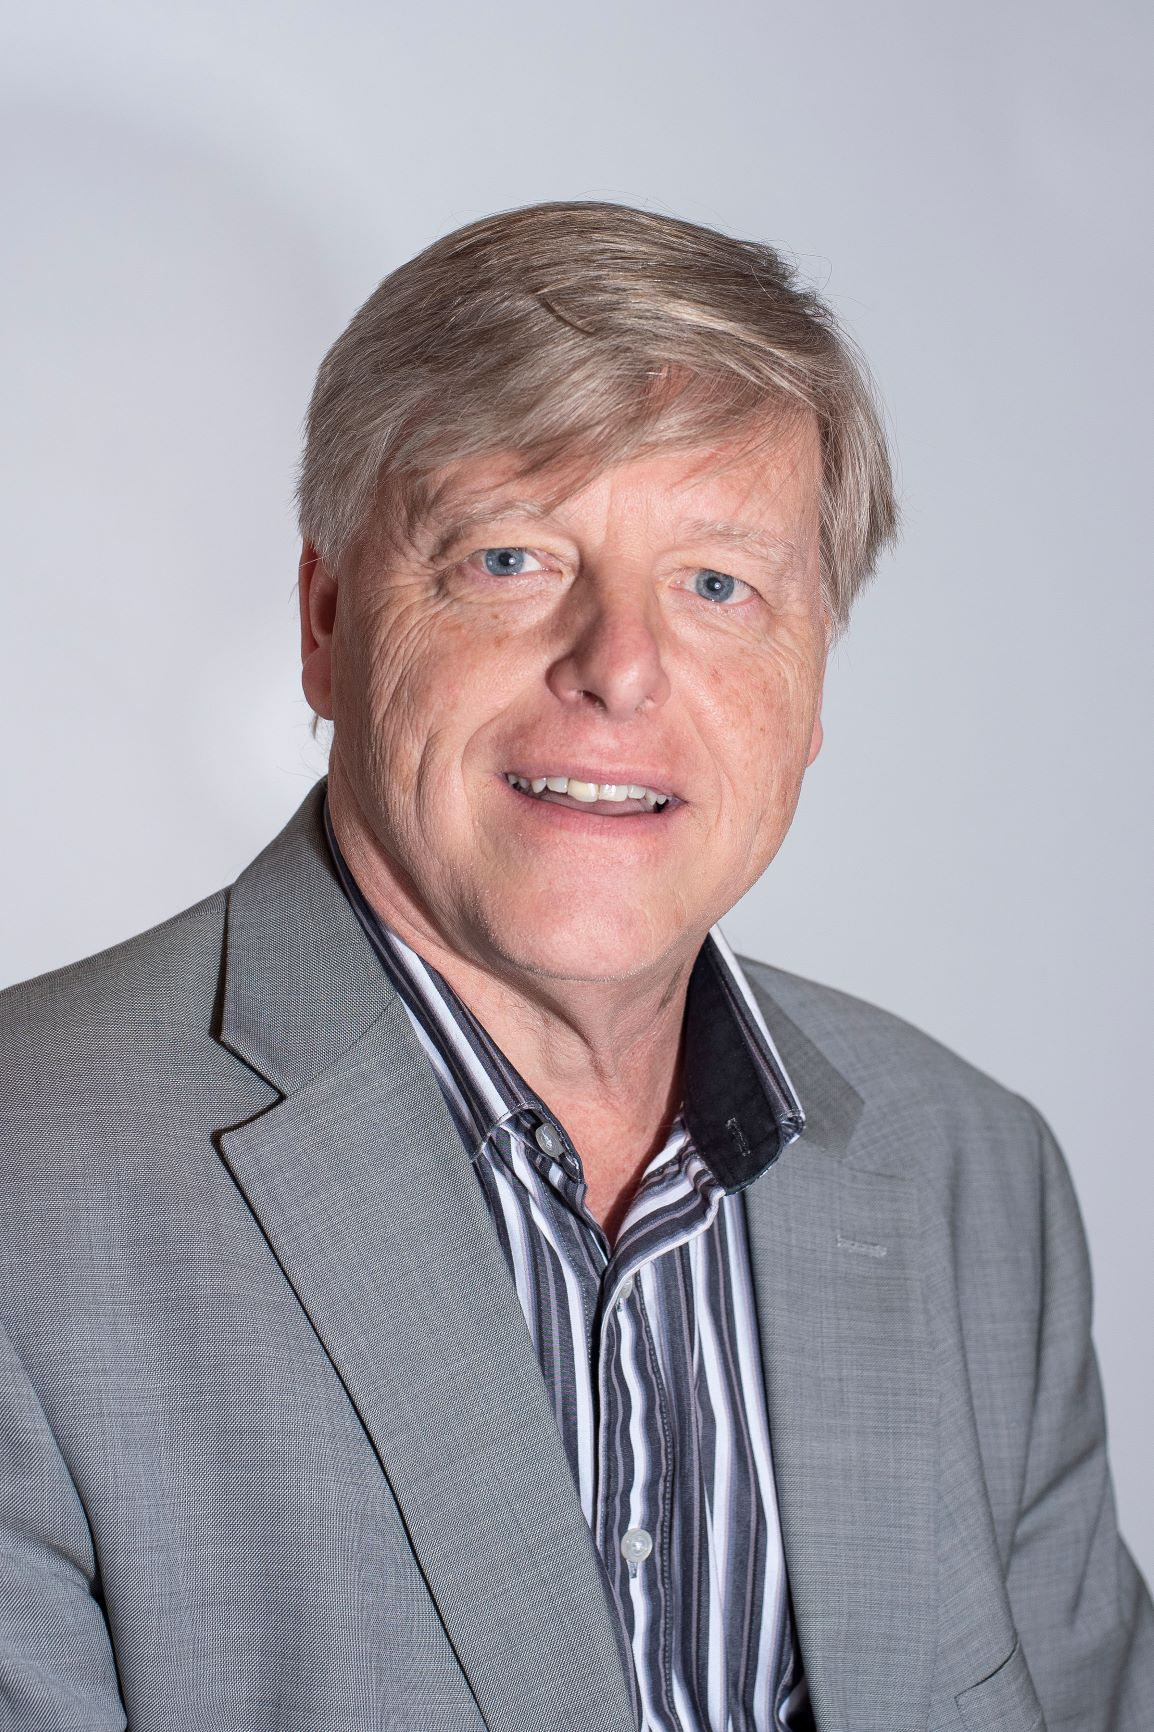 Dennis Kennedy